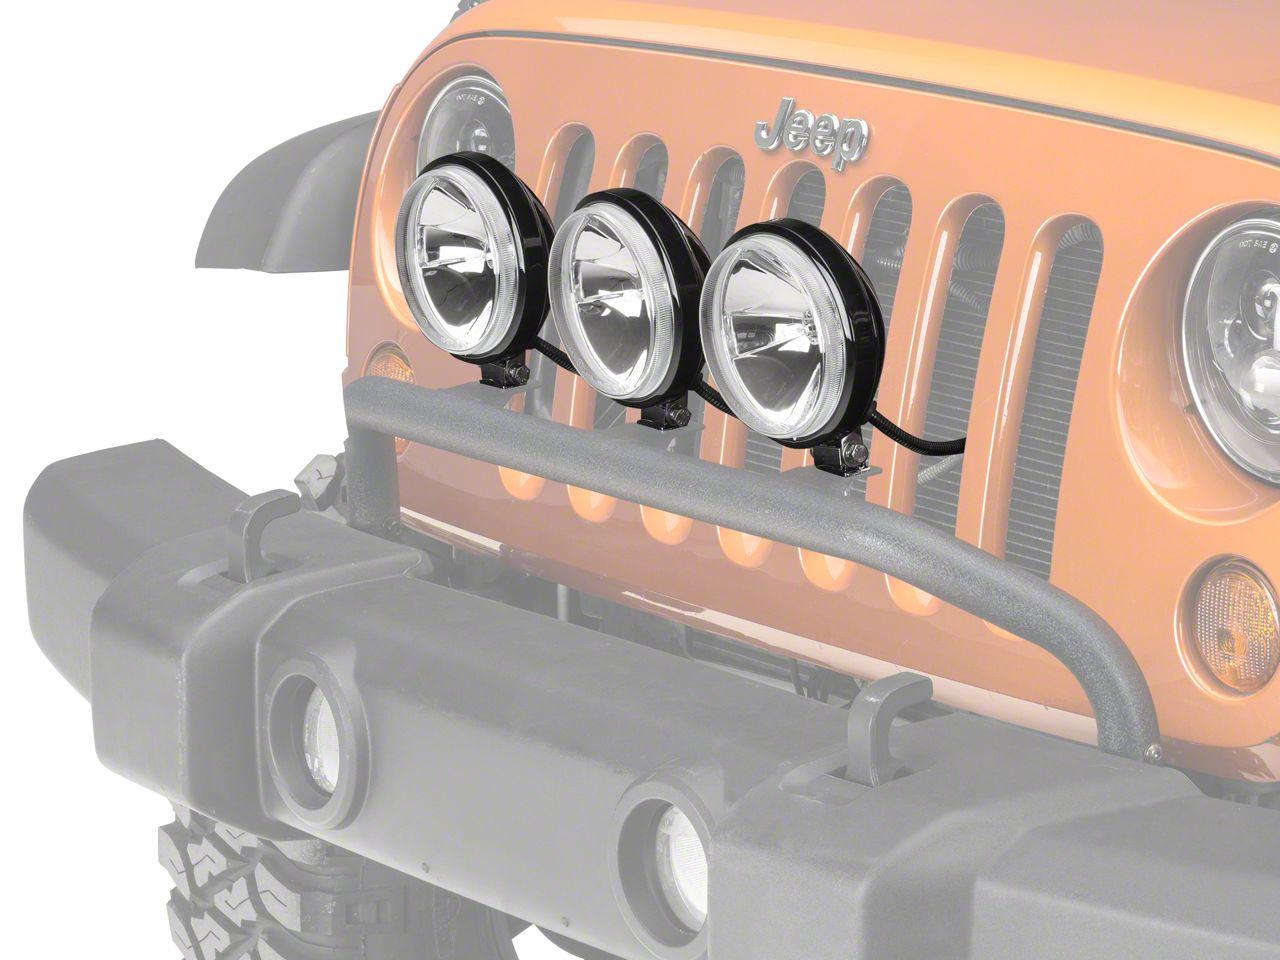 Rugged Ridge 5 in. Round Halogen Off-Road Fog Lights w/ Front Bumper Light Bar (07-18 Jeep Wrangler JK; 2018 Jeep Wrangler JL)